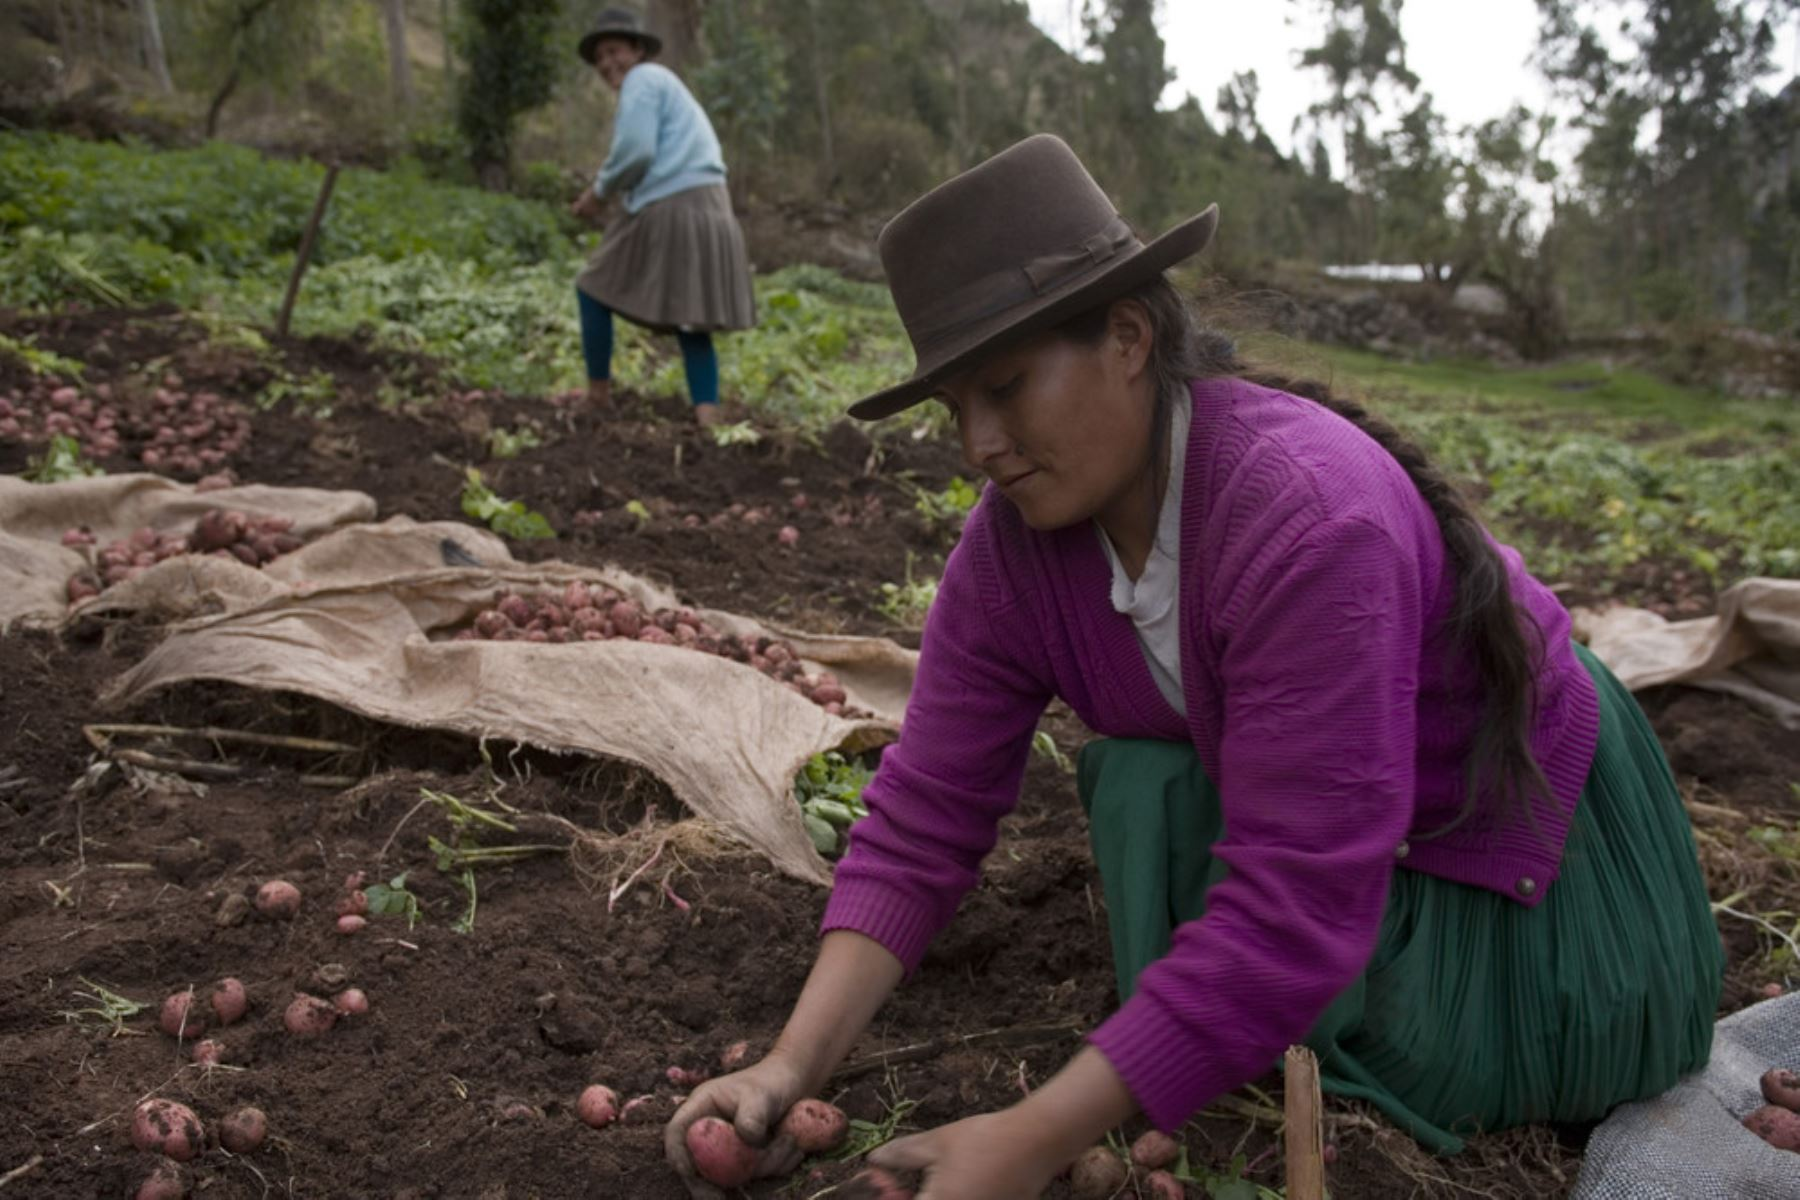 Foto: Productora agraria en zona rural.